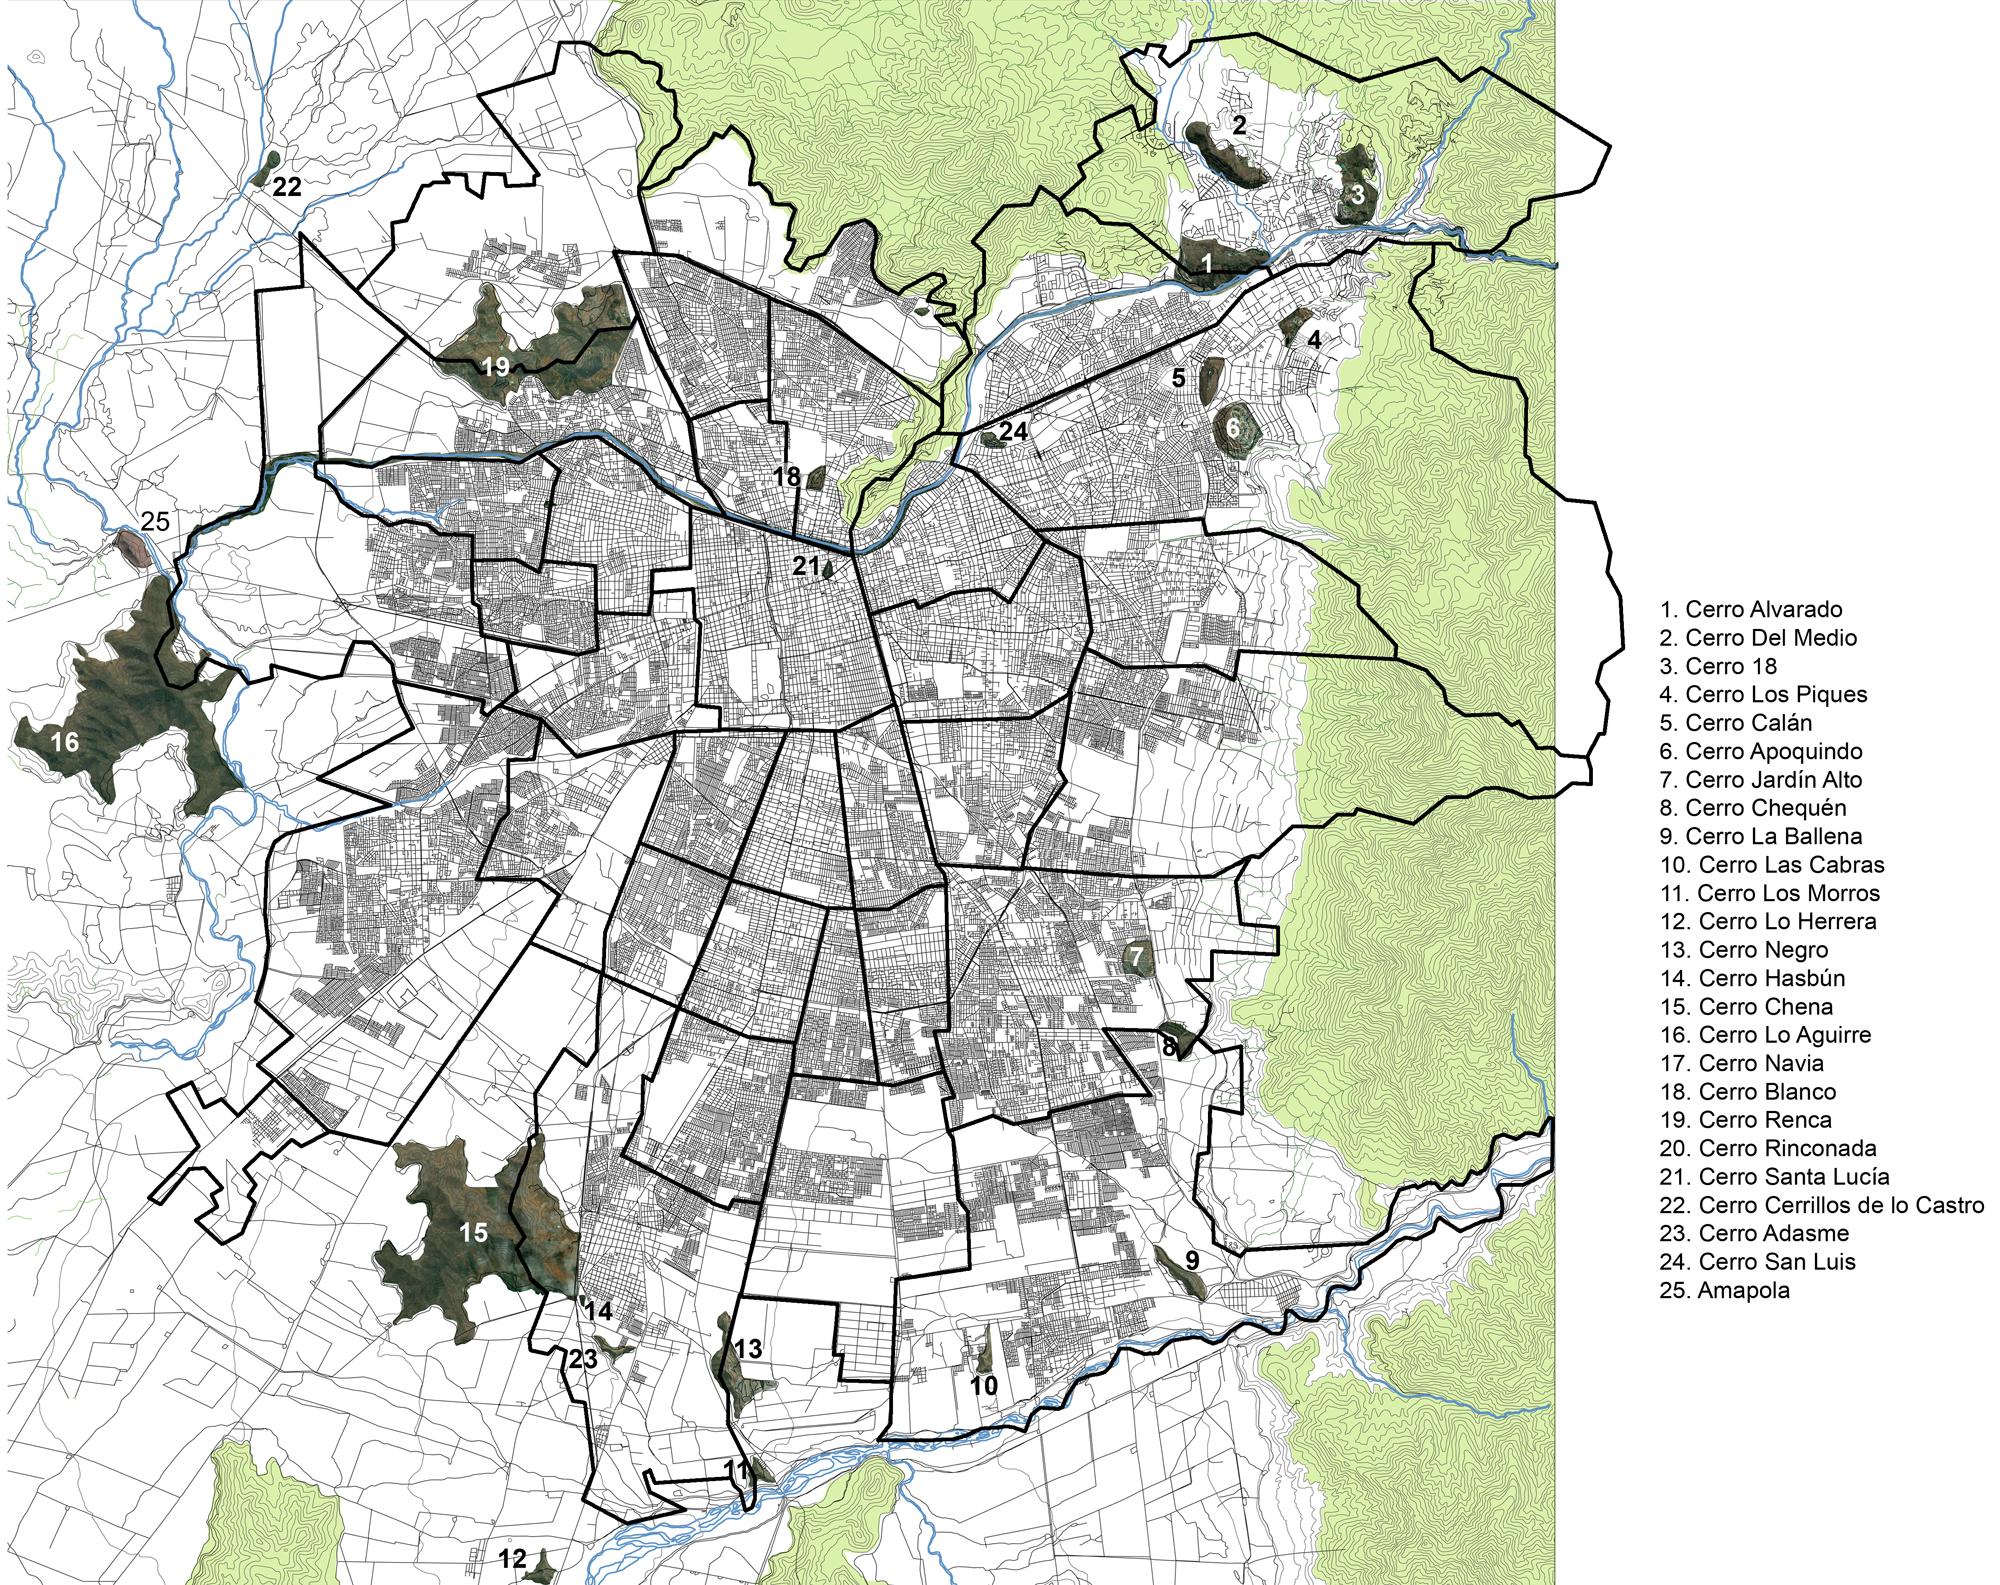 mapa cerros nombres + comunas - Plataforma Urbana